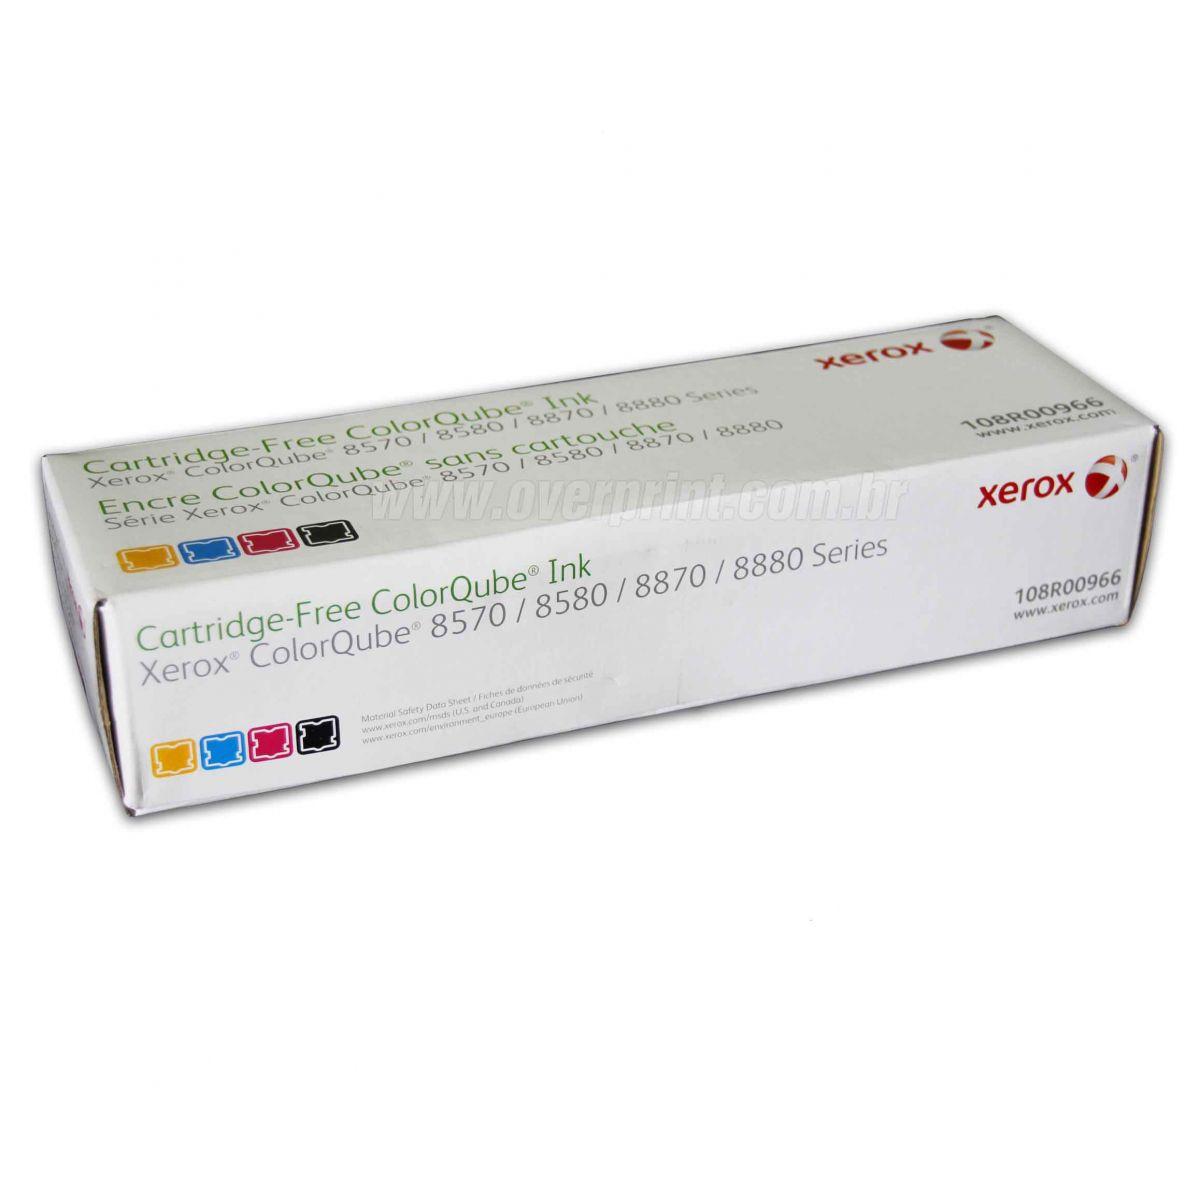 Kit Bastões de Cera Original Xerox ColorQube 8570/8580/8870/8880 (4 cores)  - Overprint